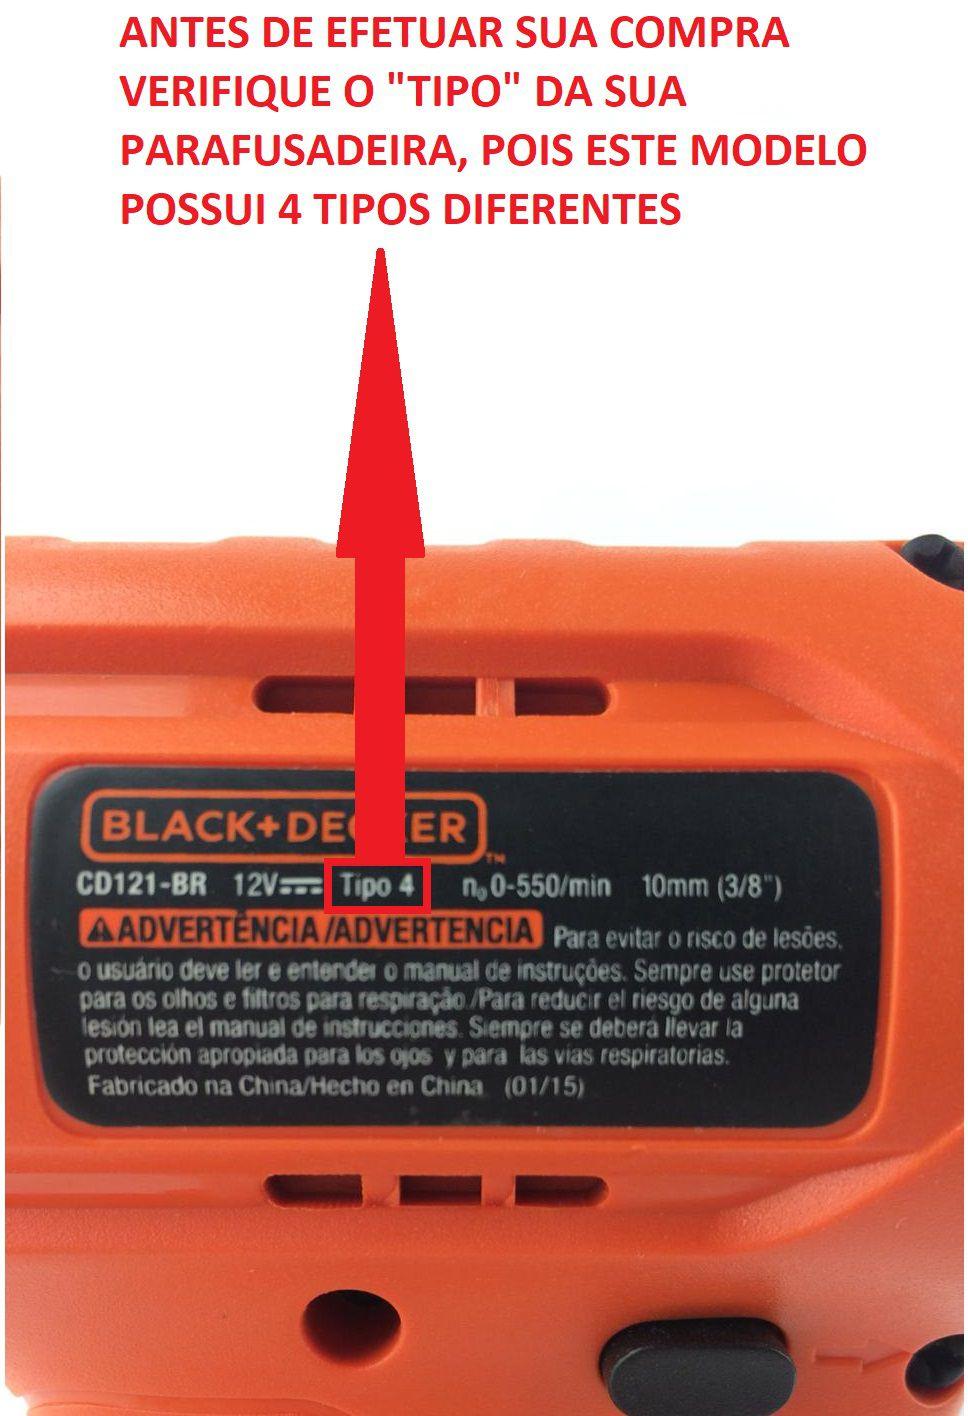 Bateria Parafusadeira 12v CD121 Black+Decker 5140056-42